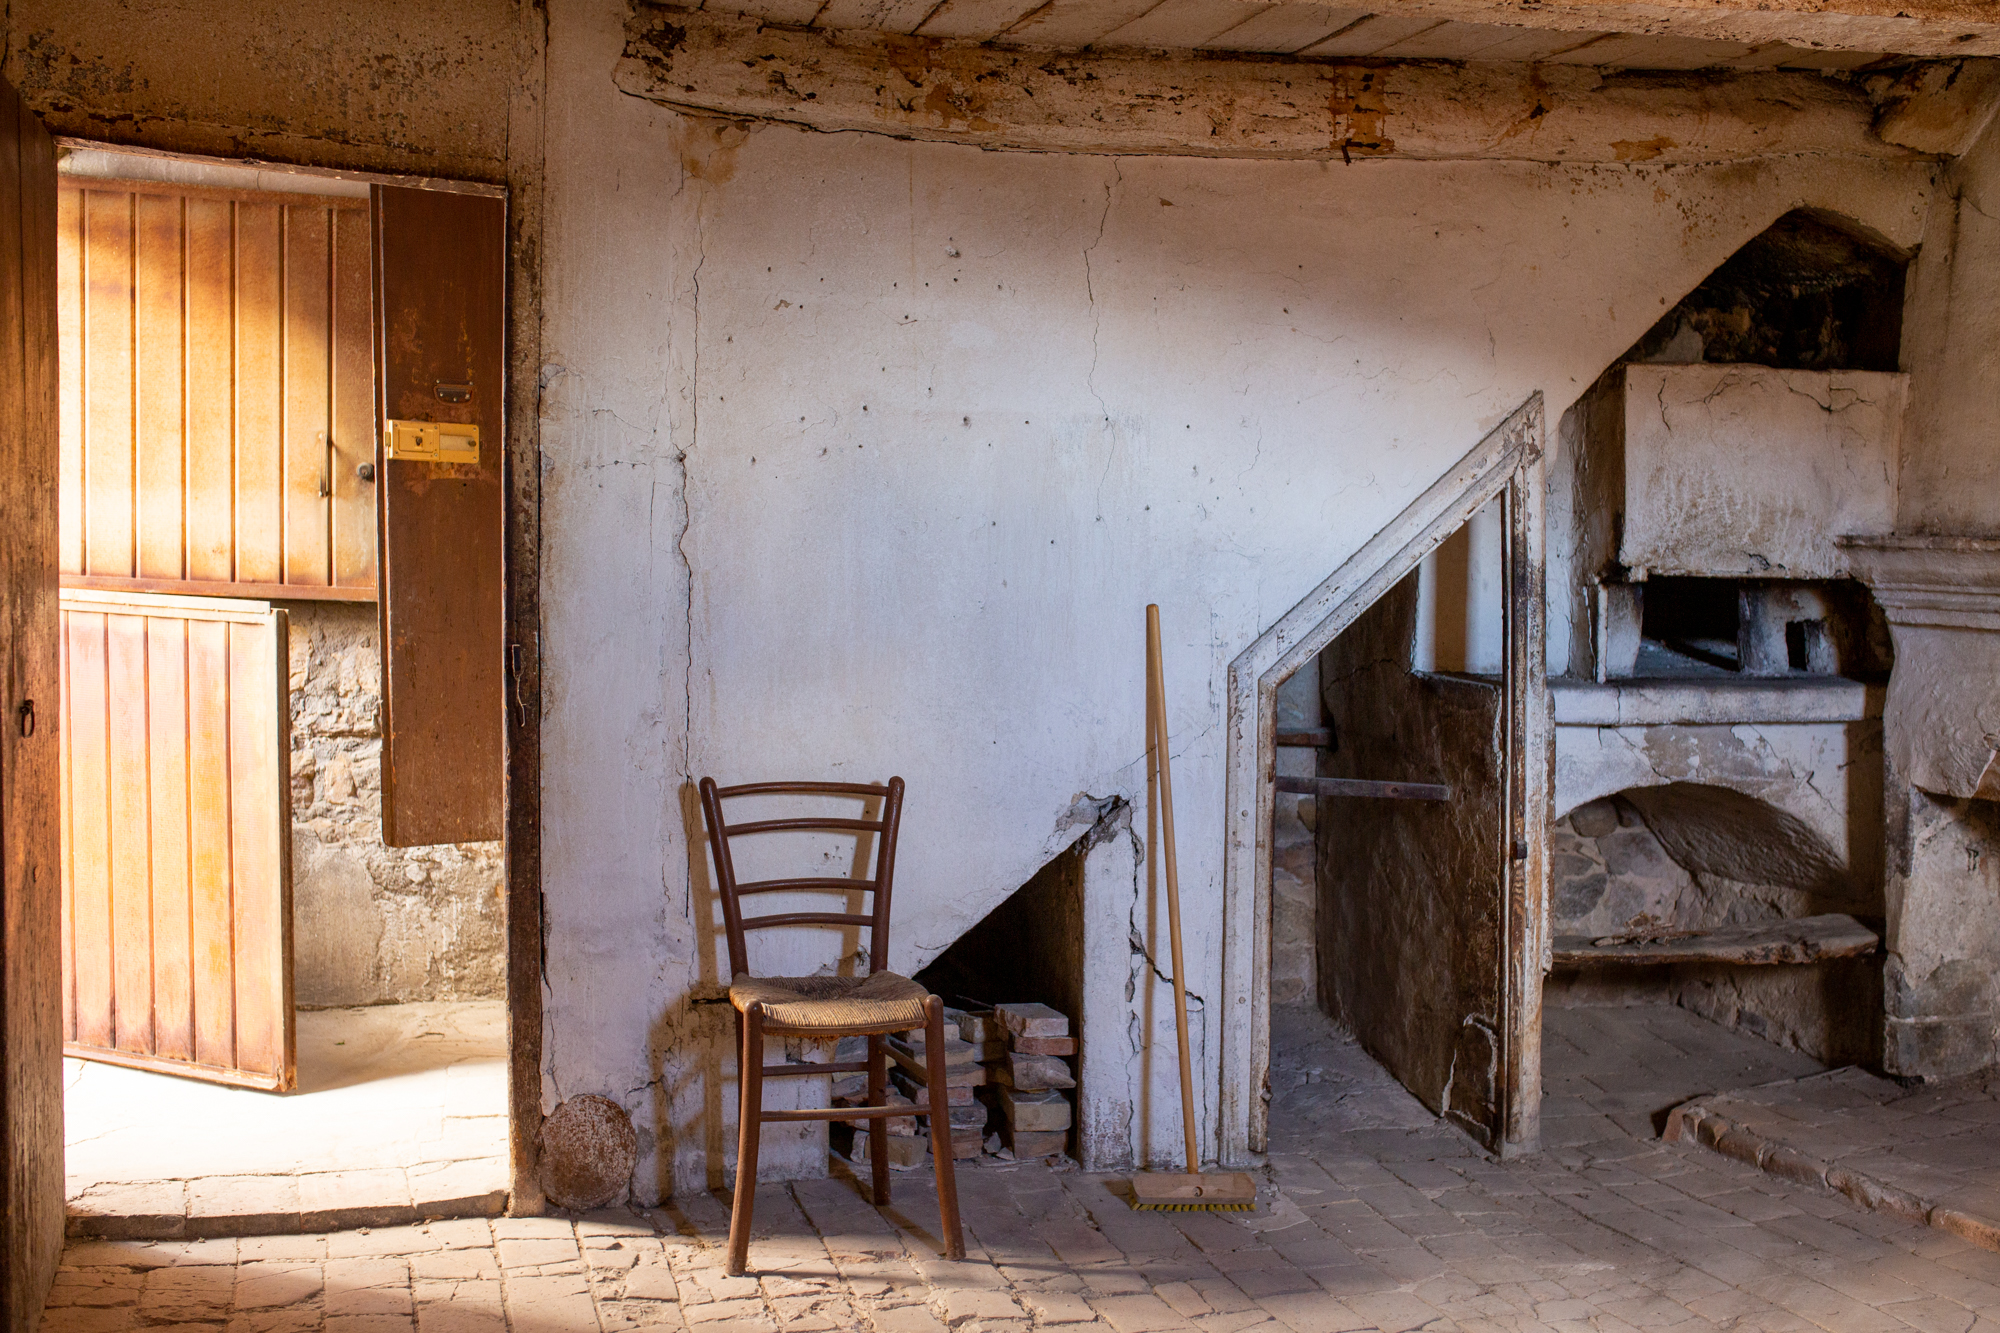 Rif 1207 San Buono – Casa Medievale con vista panoramica